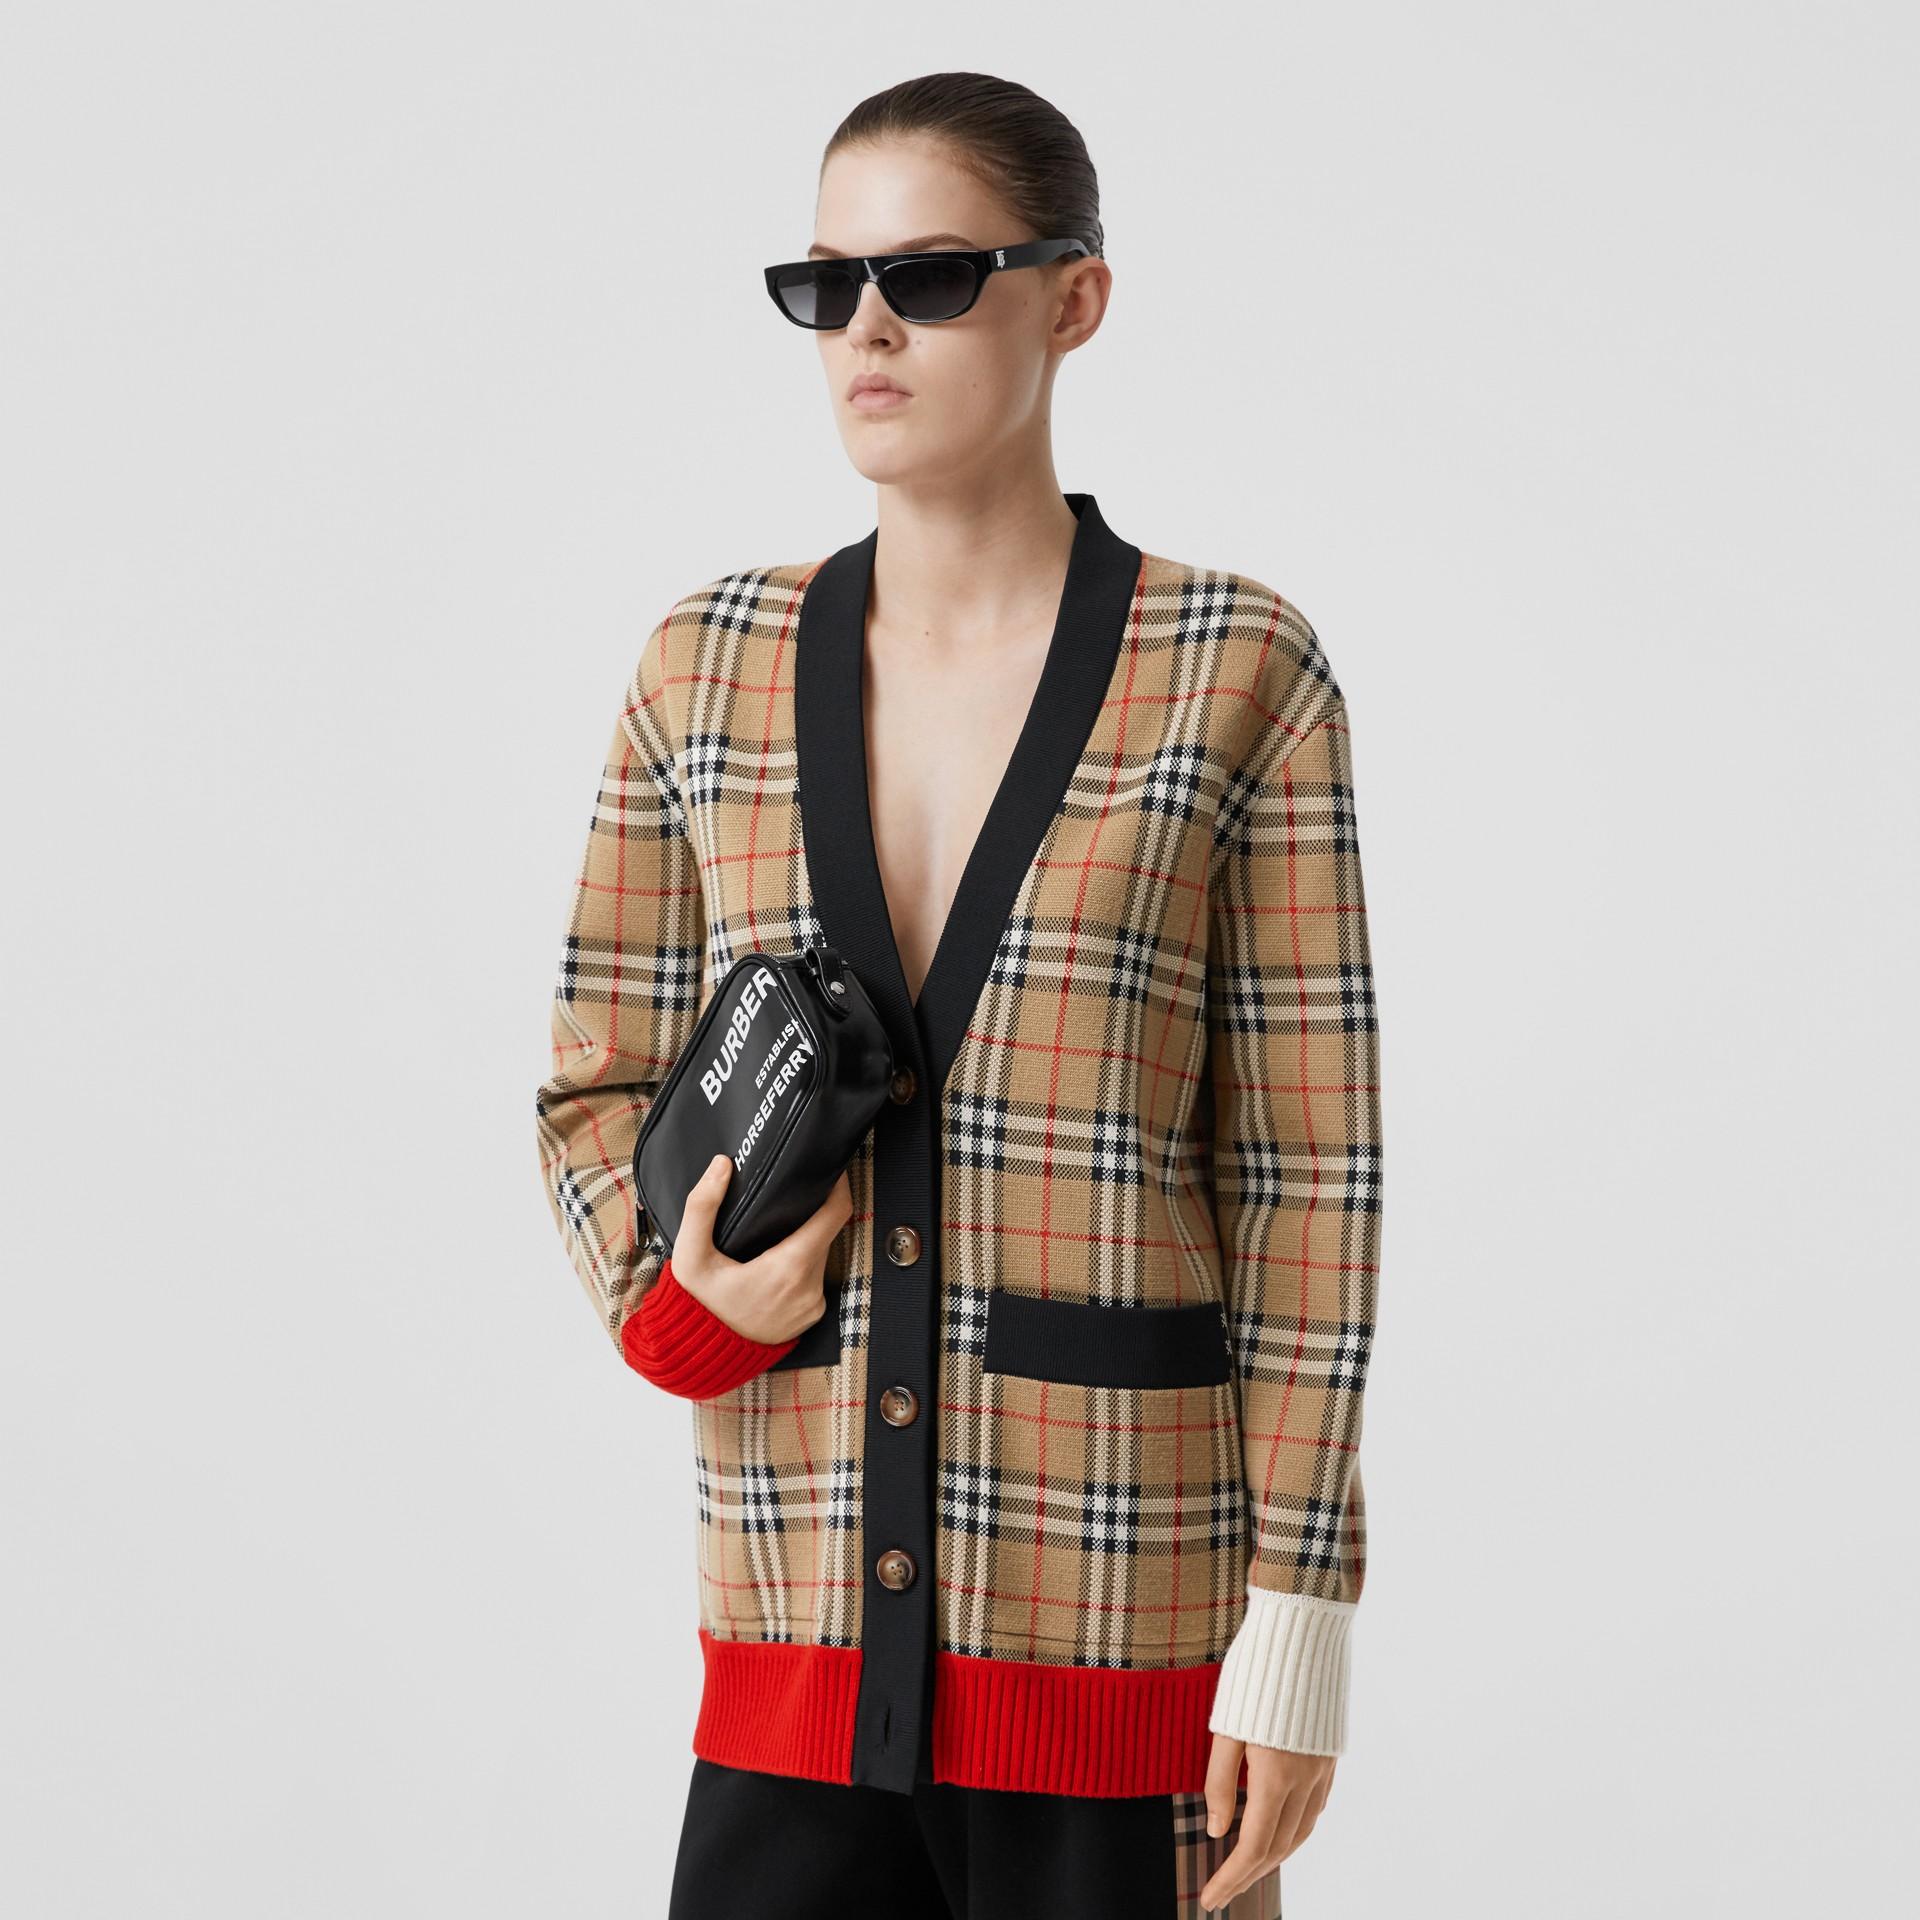 Vintage Check Merino Wool Blend Jacquard Cardigan in Archive Beige - Women   Burberry - gallery image 5